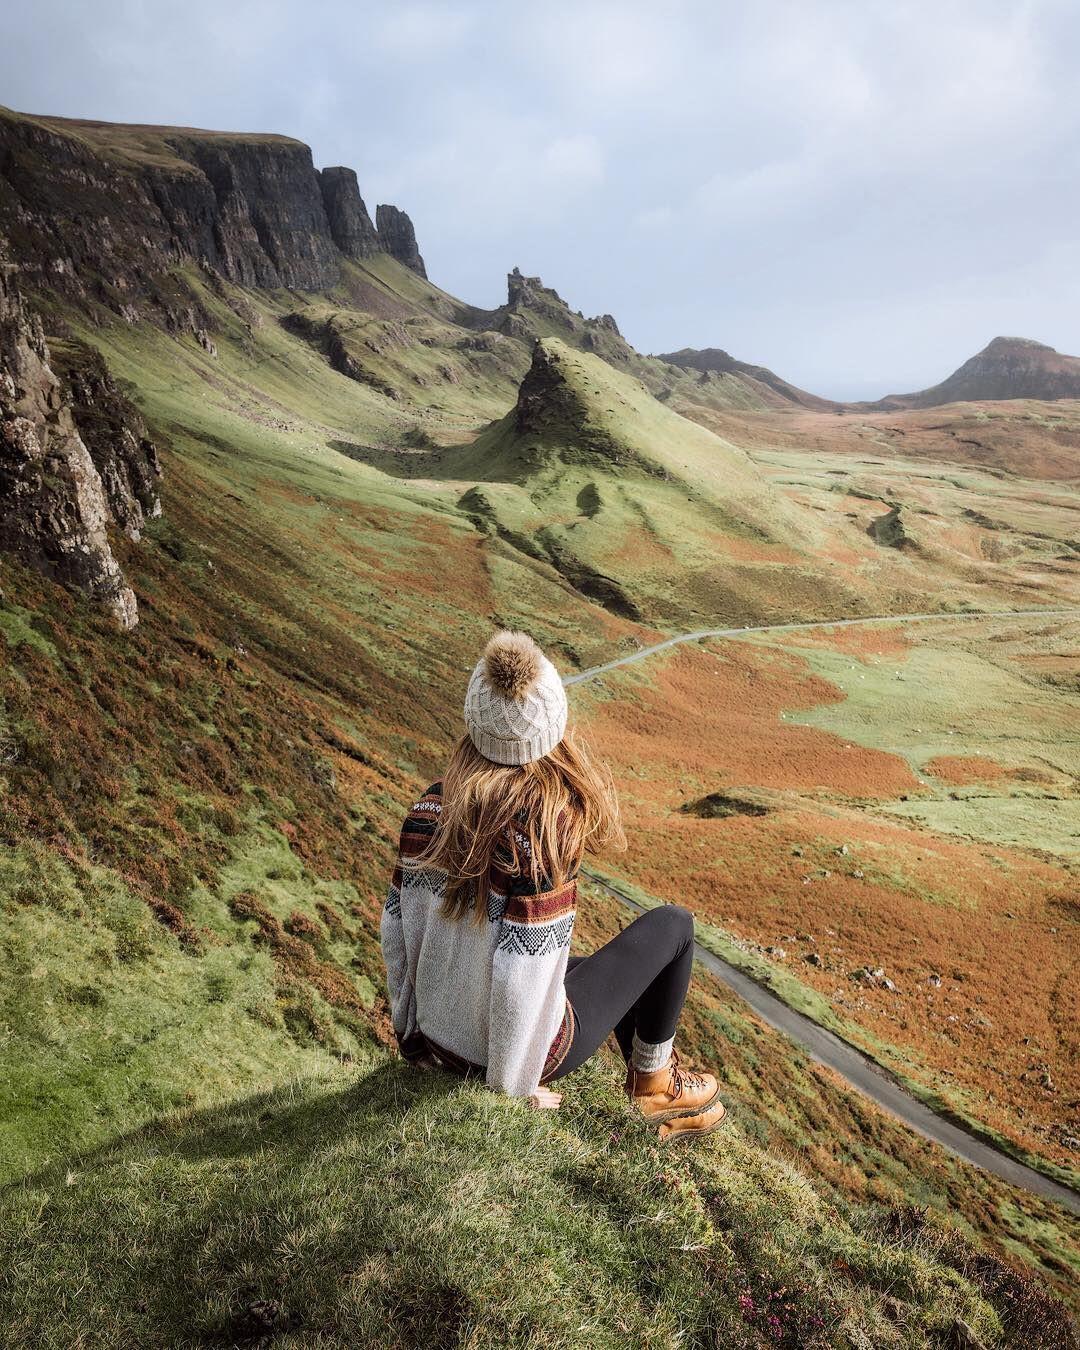 Designer outfit isle of skye, mountainous landforms, scottish highlands, natural landscape, nati ...